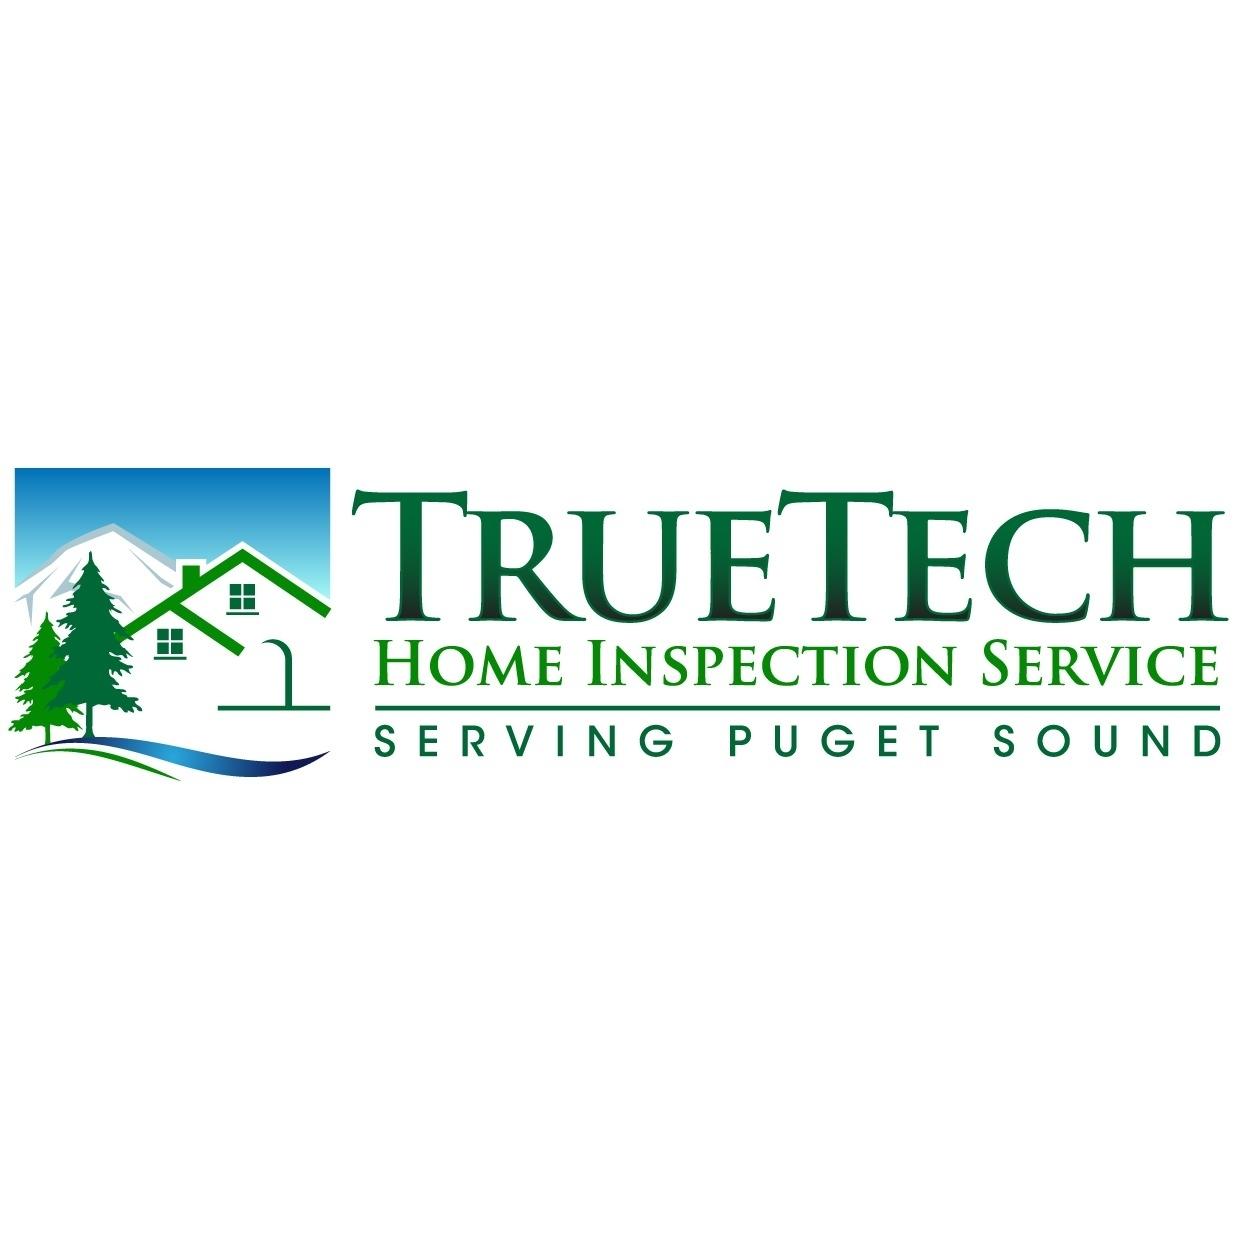 Building Inspection Services : True tech home inspection service llc in belfair wa